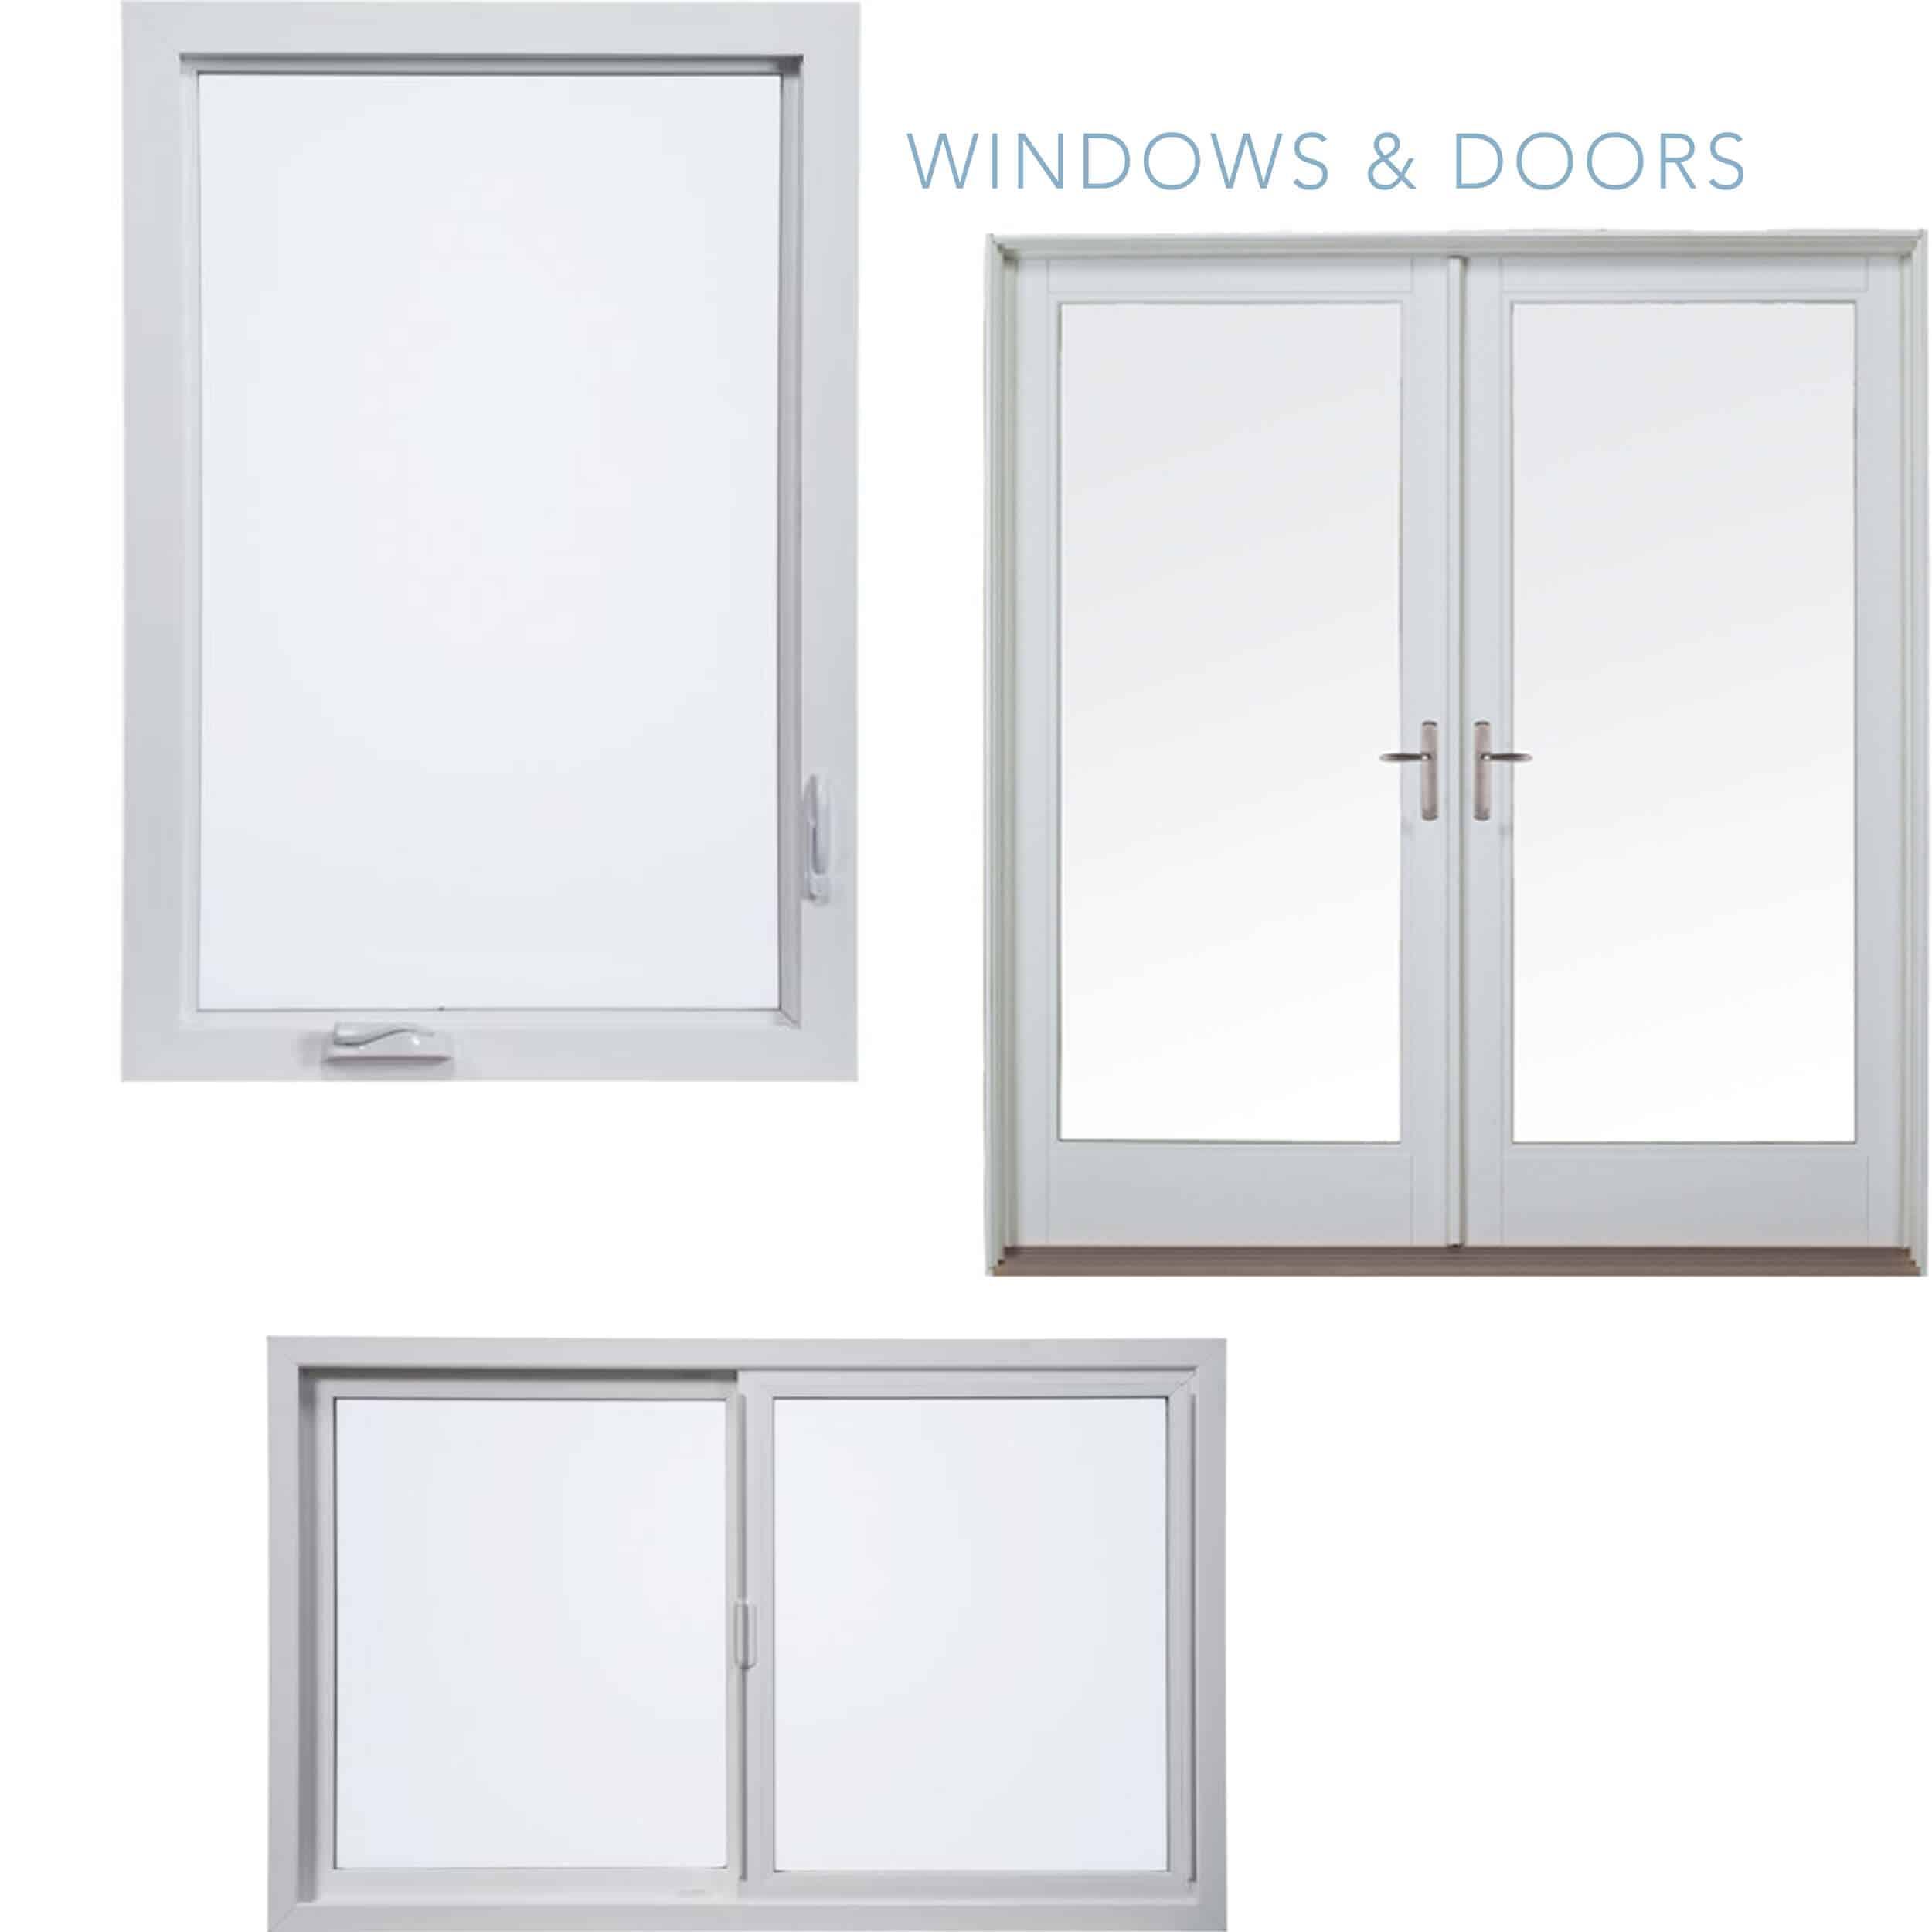 ormomdo-windows